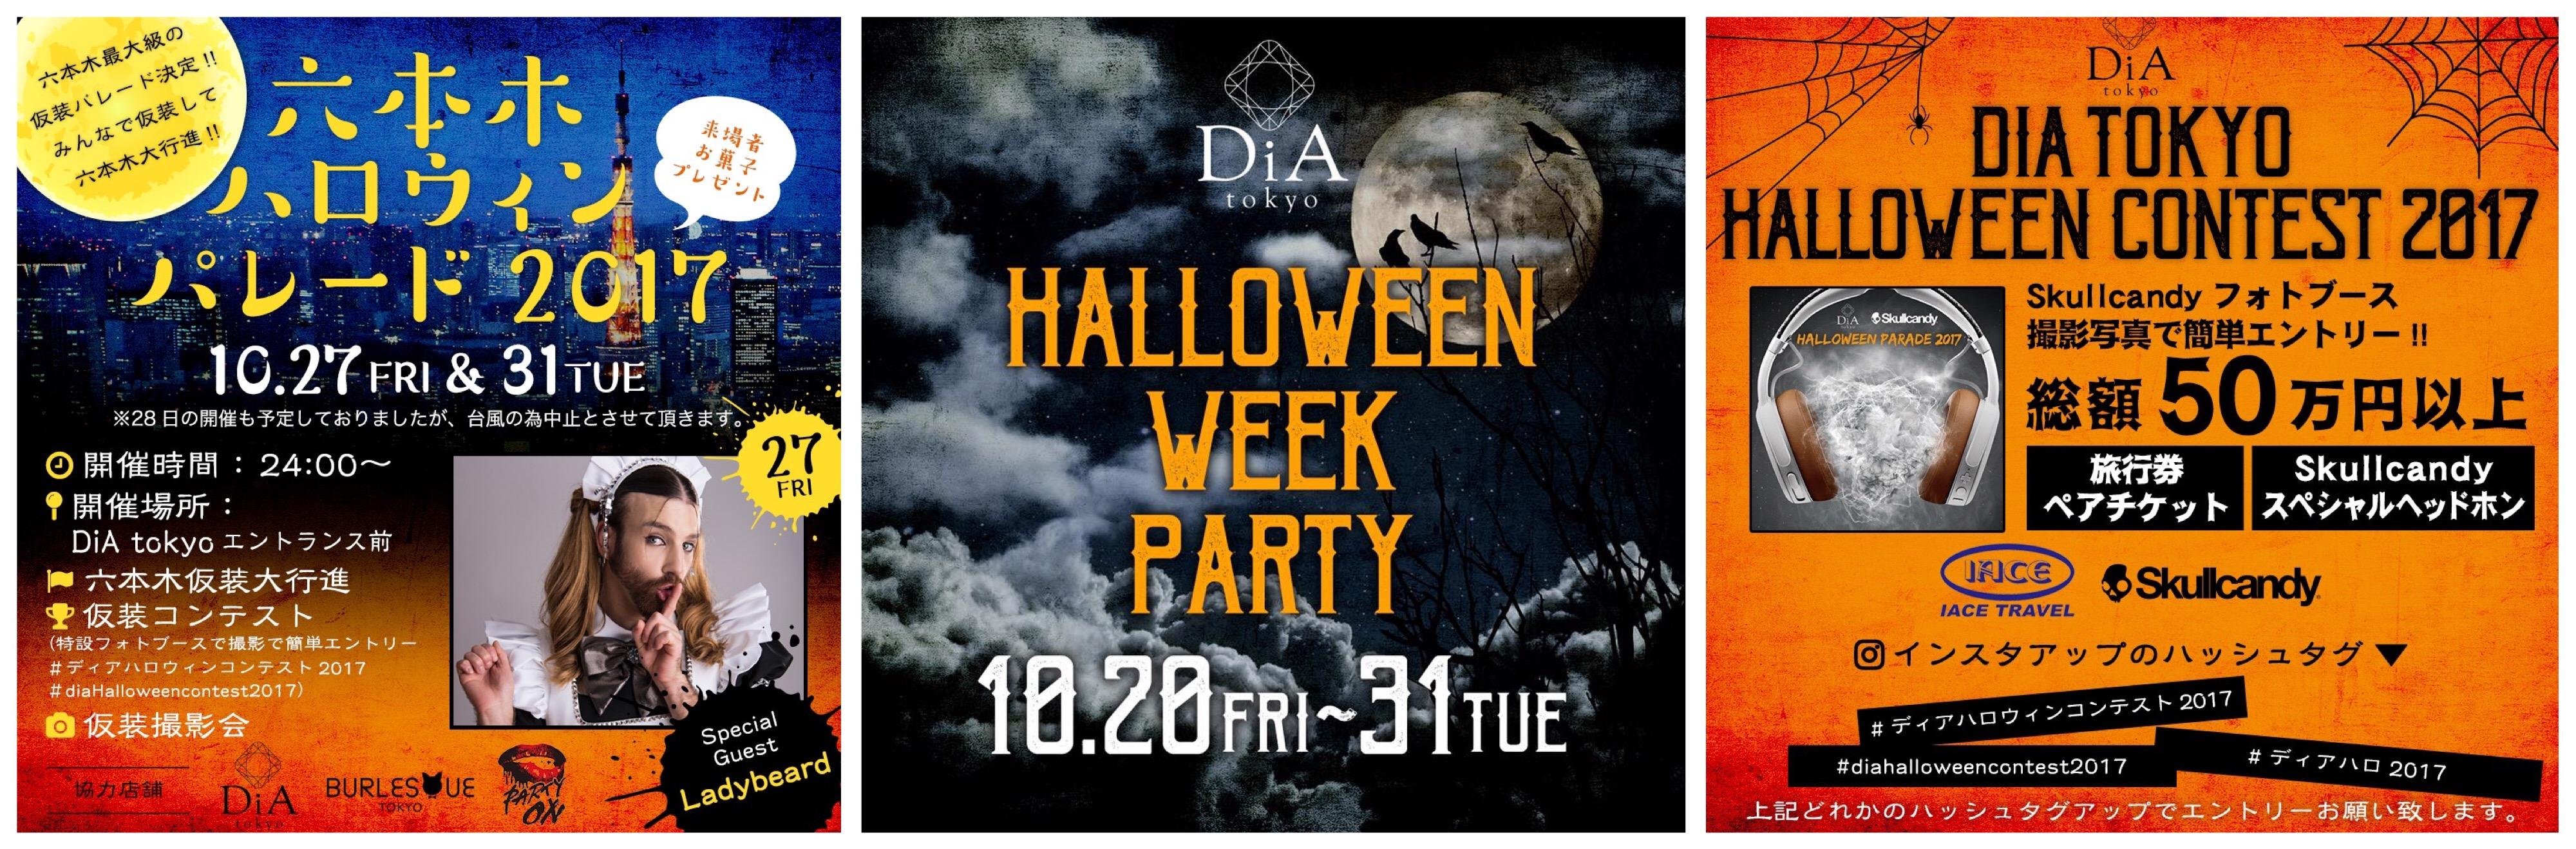 DiA のハロウィンイベント